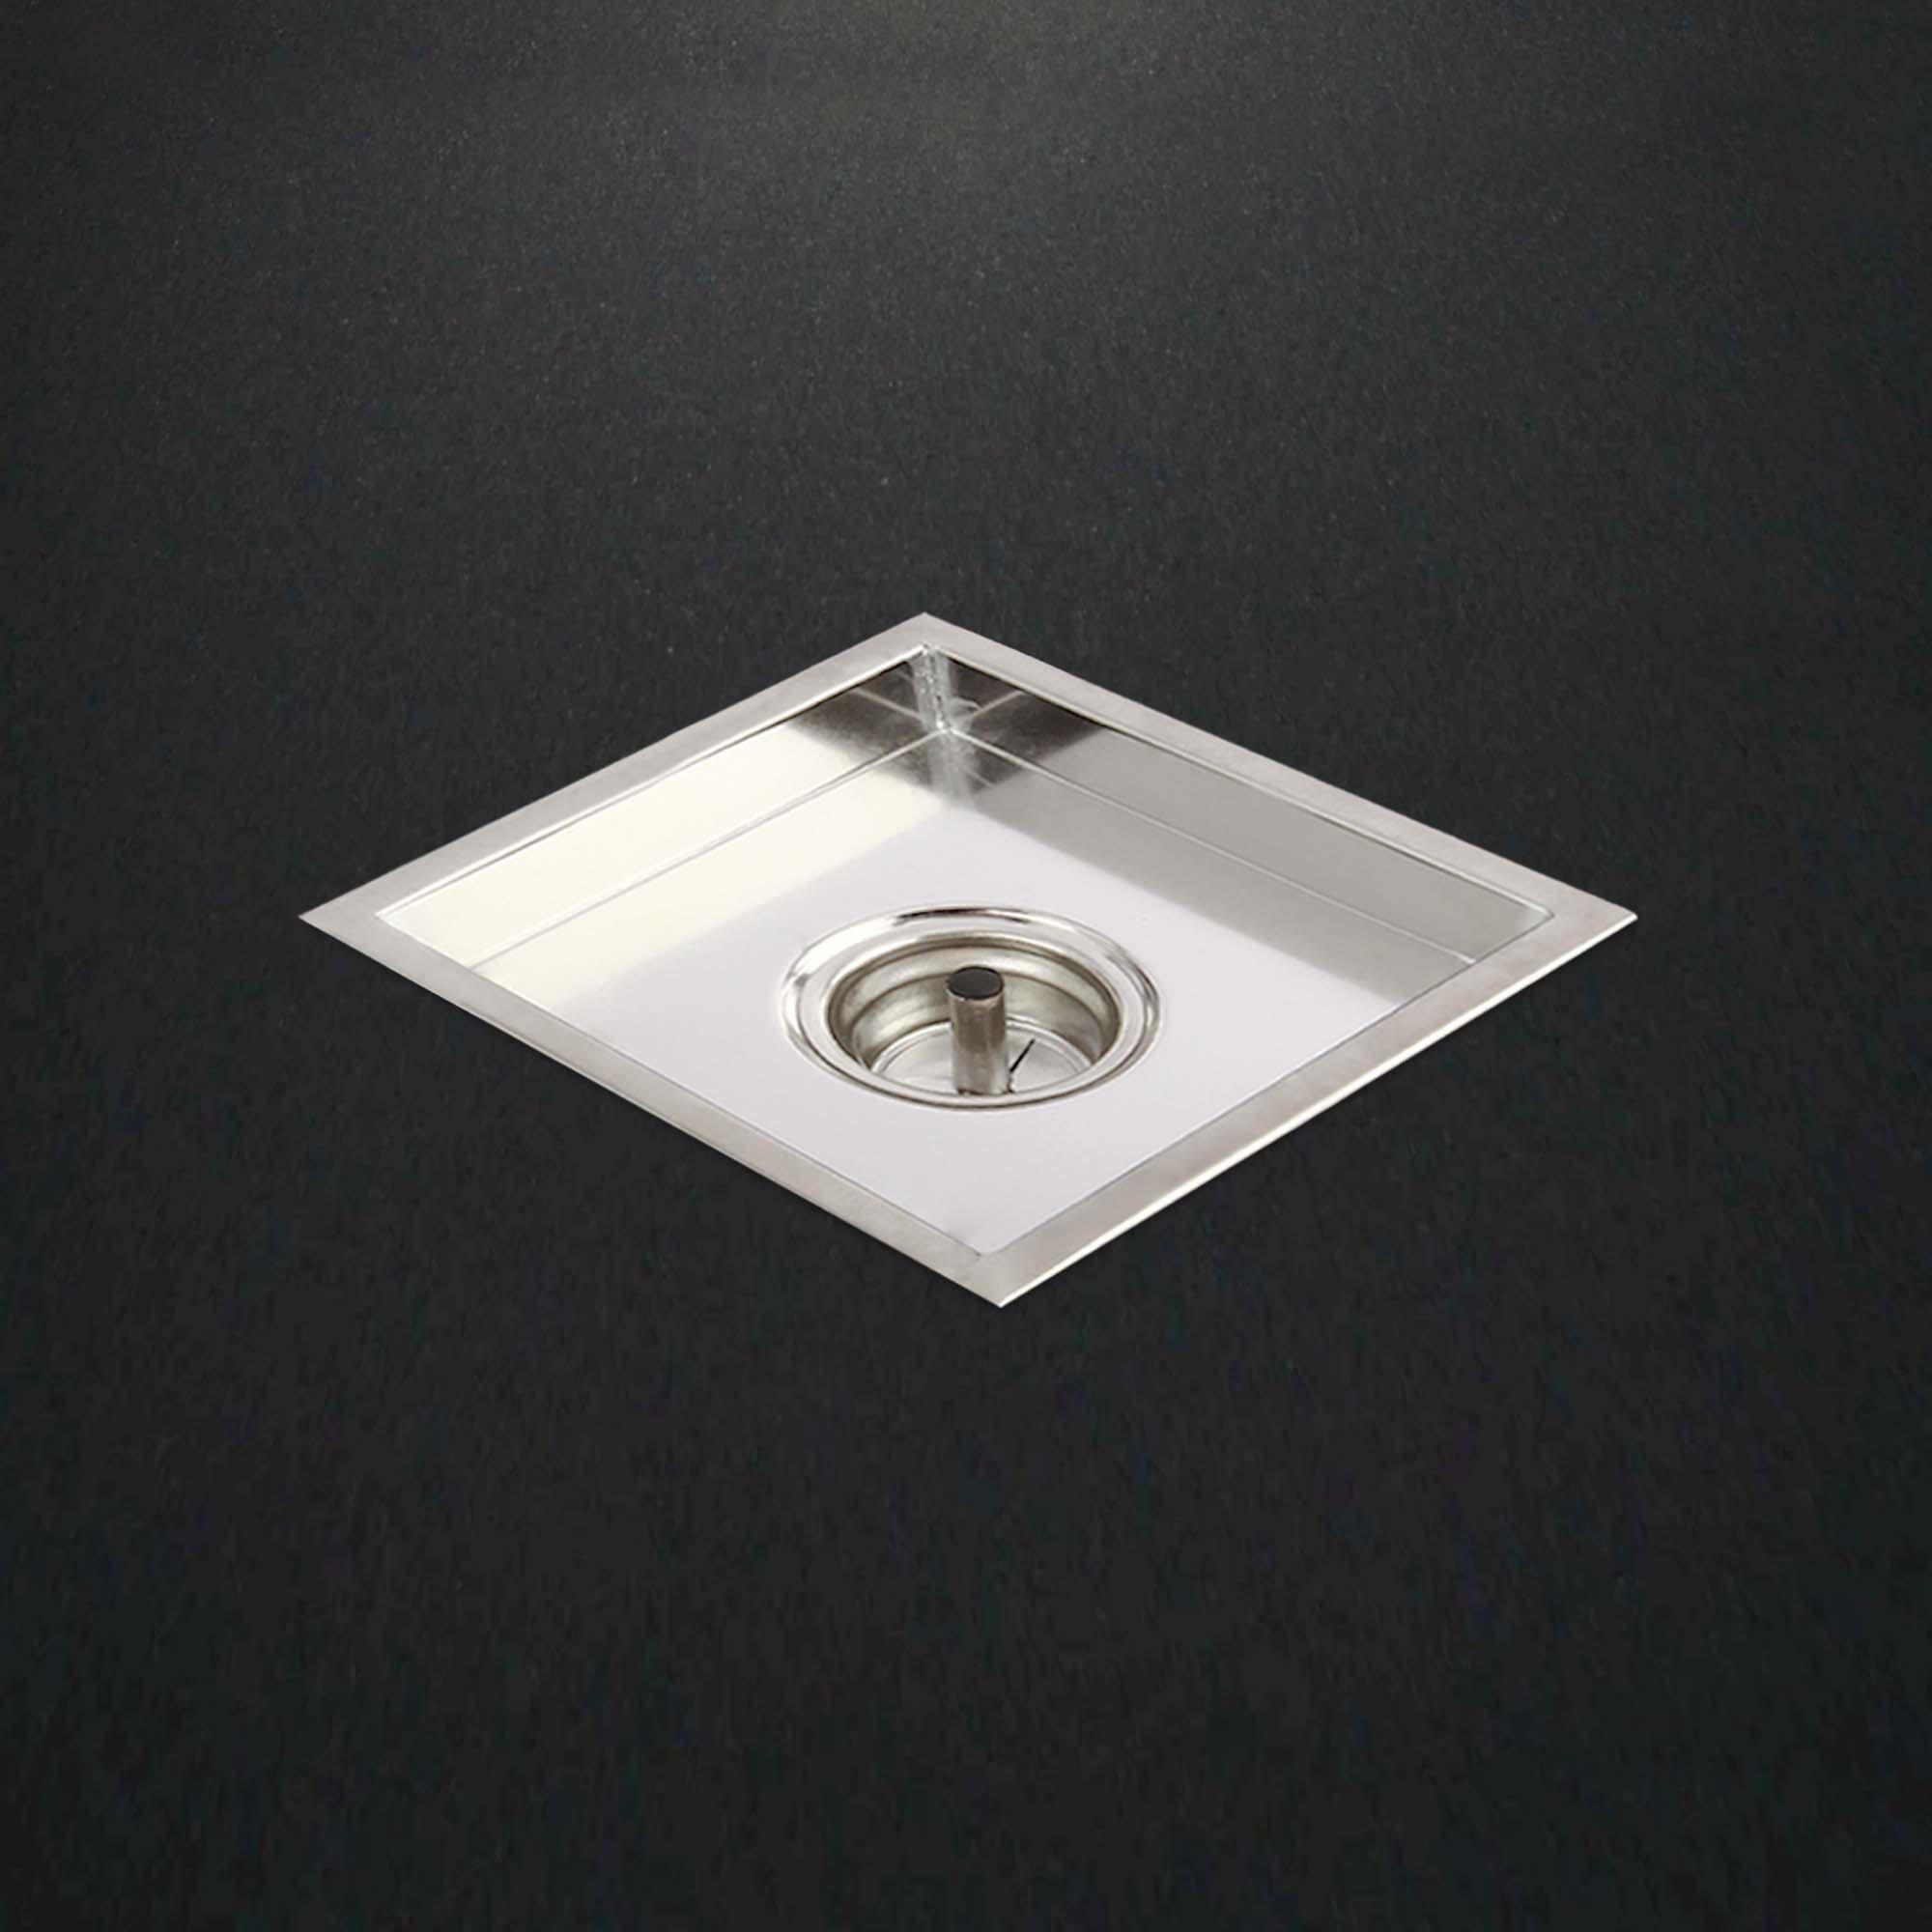 Square Insert Tile Channel Drain